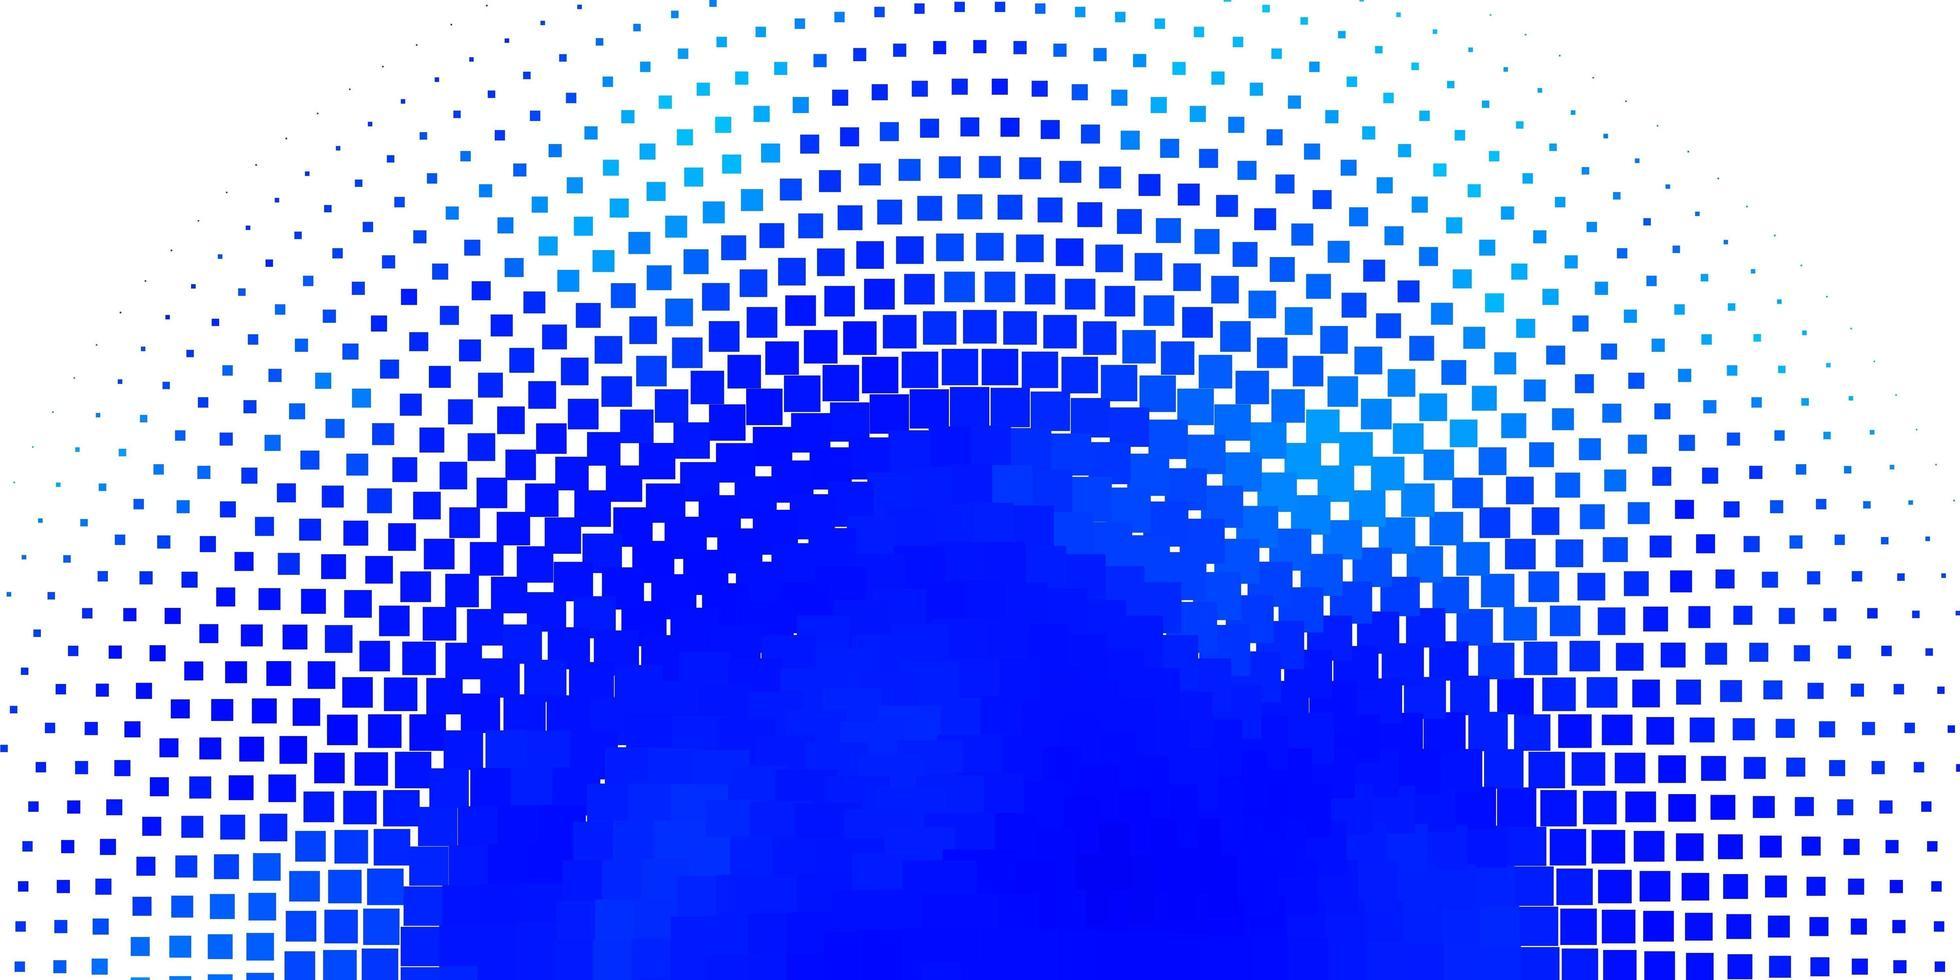 telón de fondo azul con rectángulos. vector